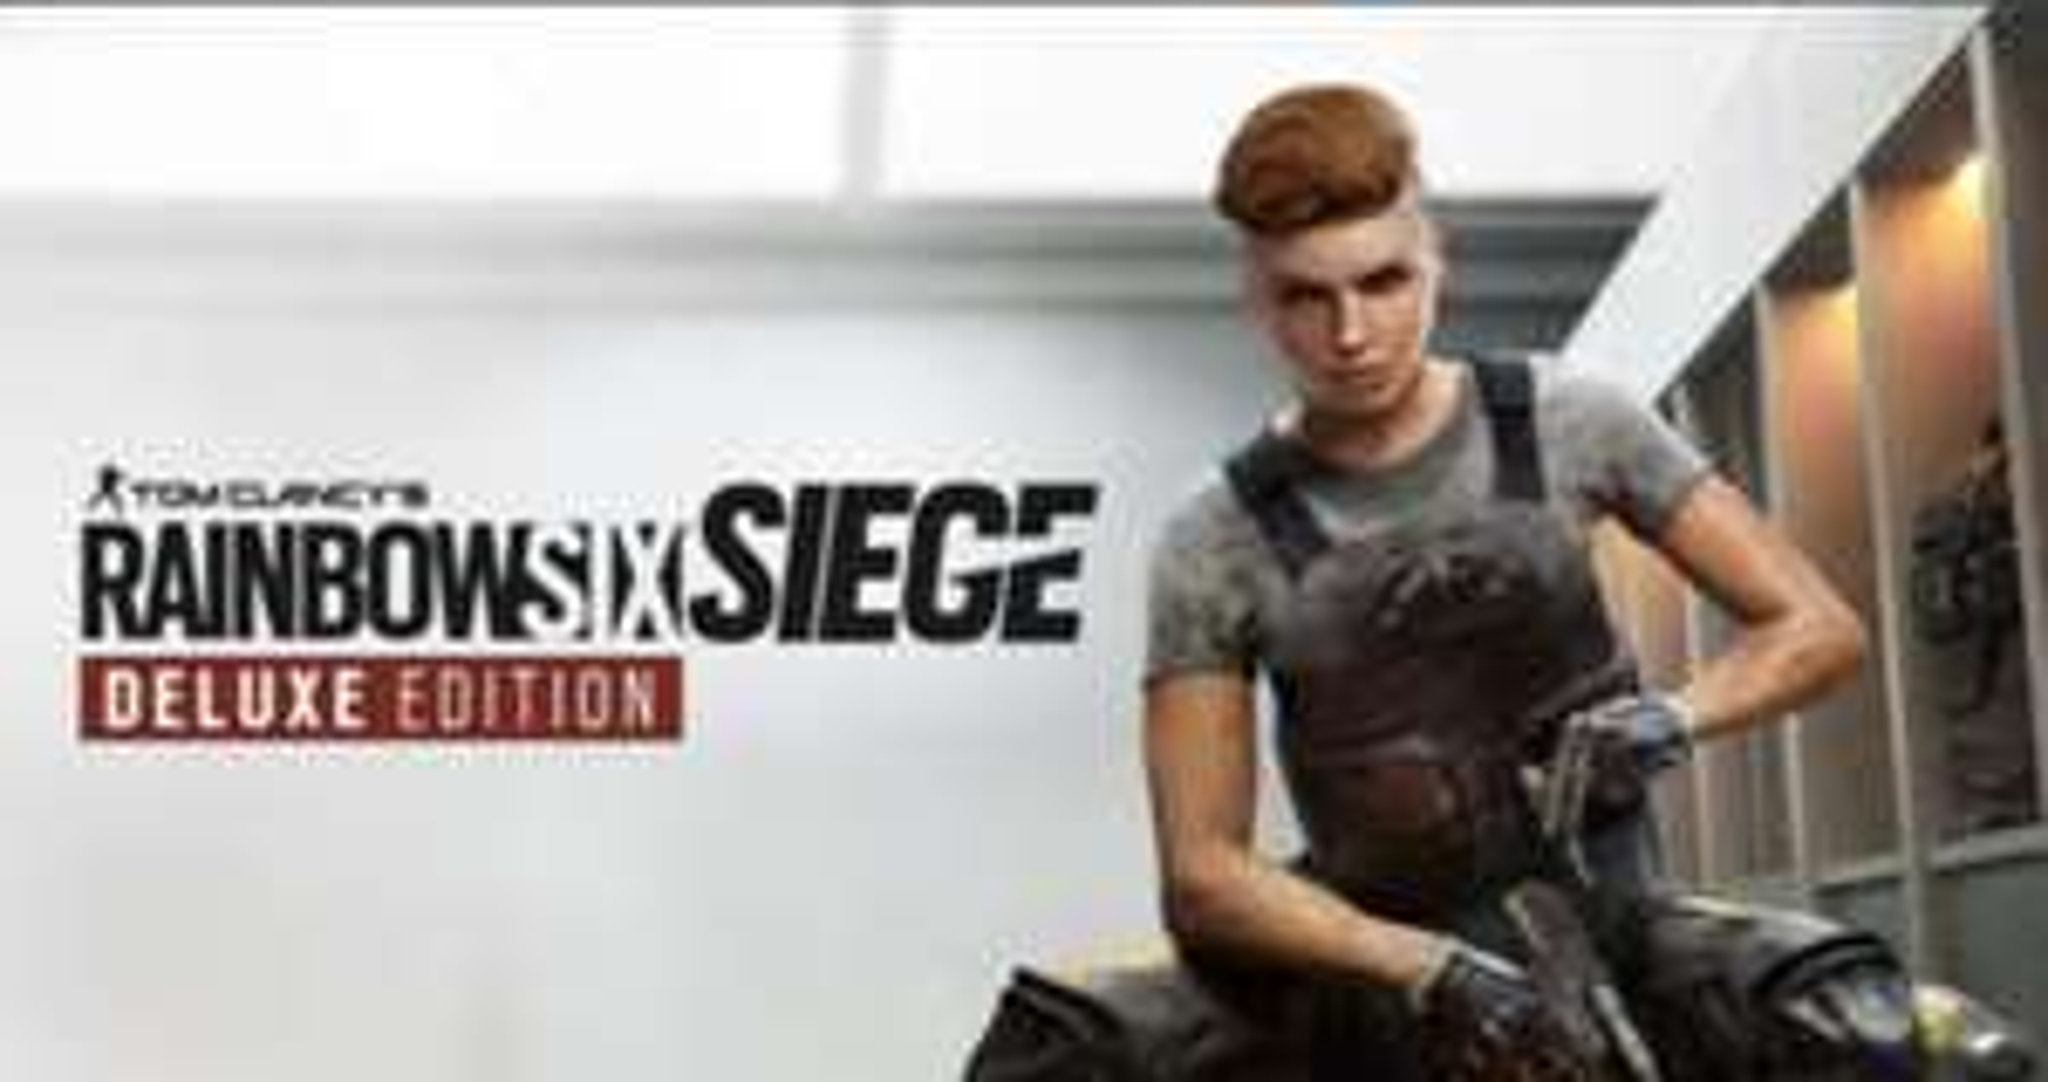 Rainbow Six Siege Deluxe Edition PC (EU) £7.19 @ WinGameStore